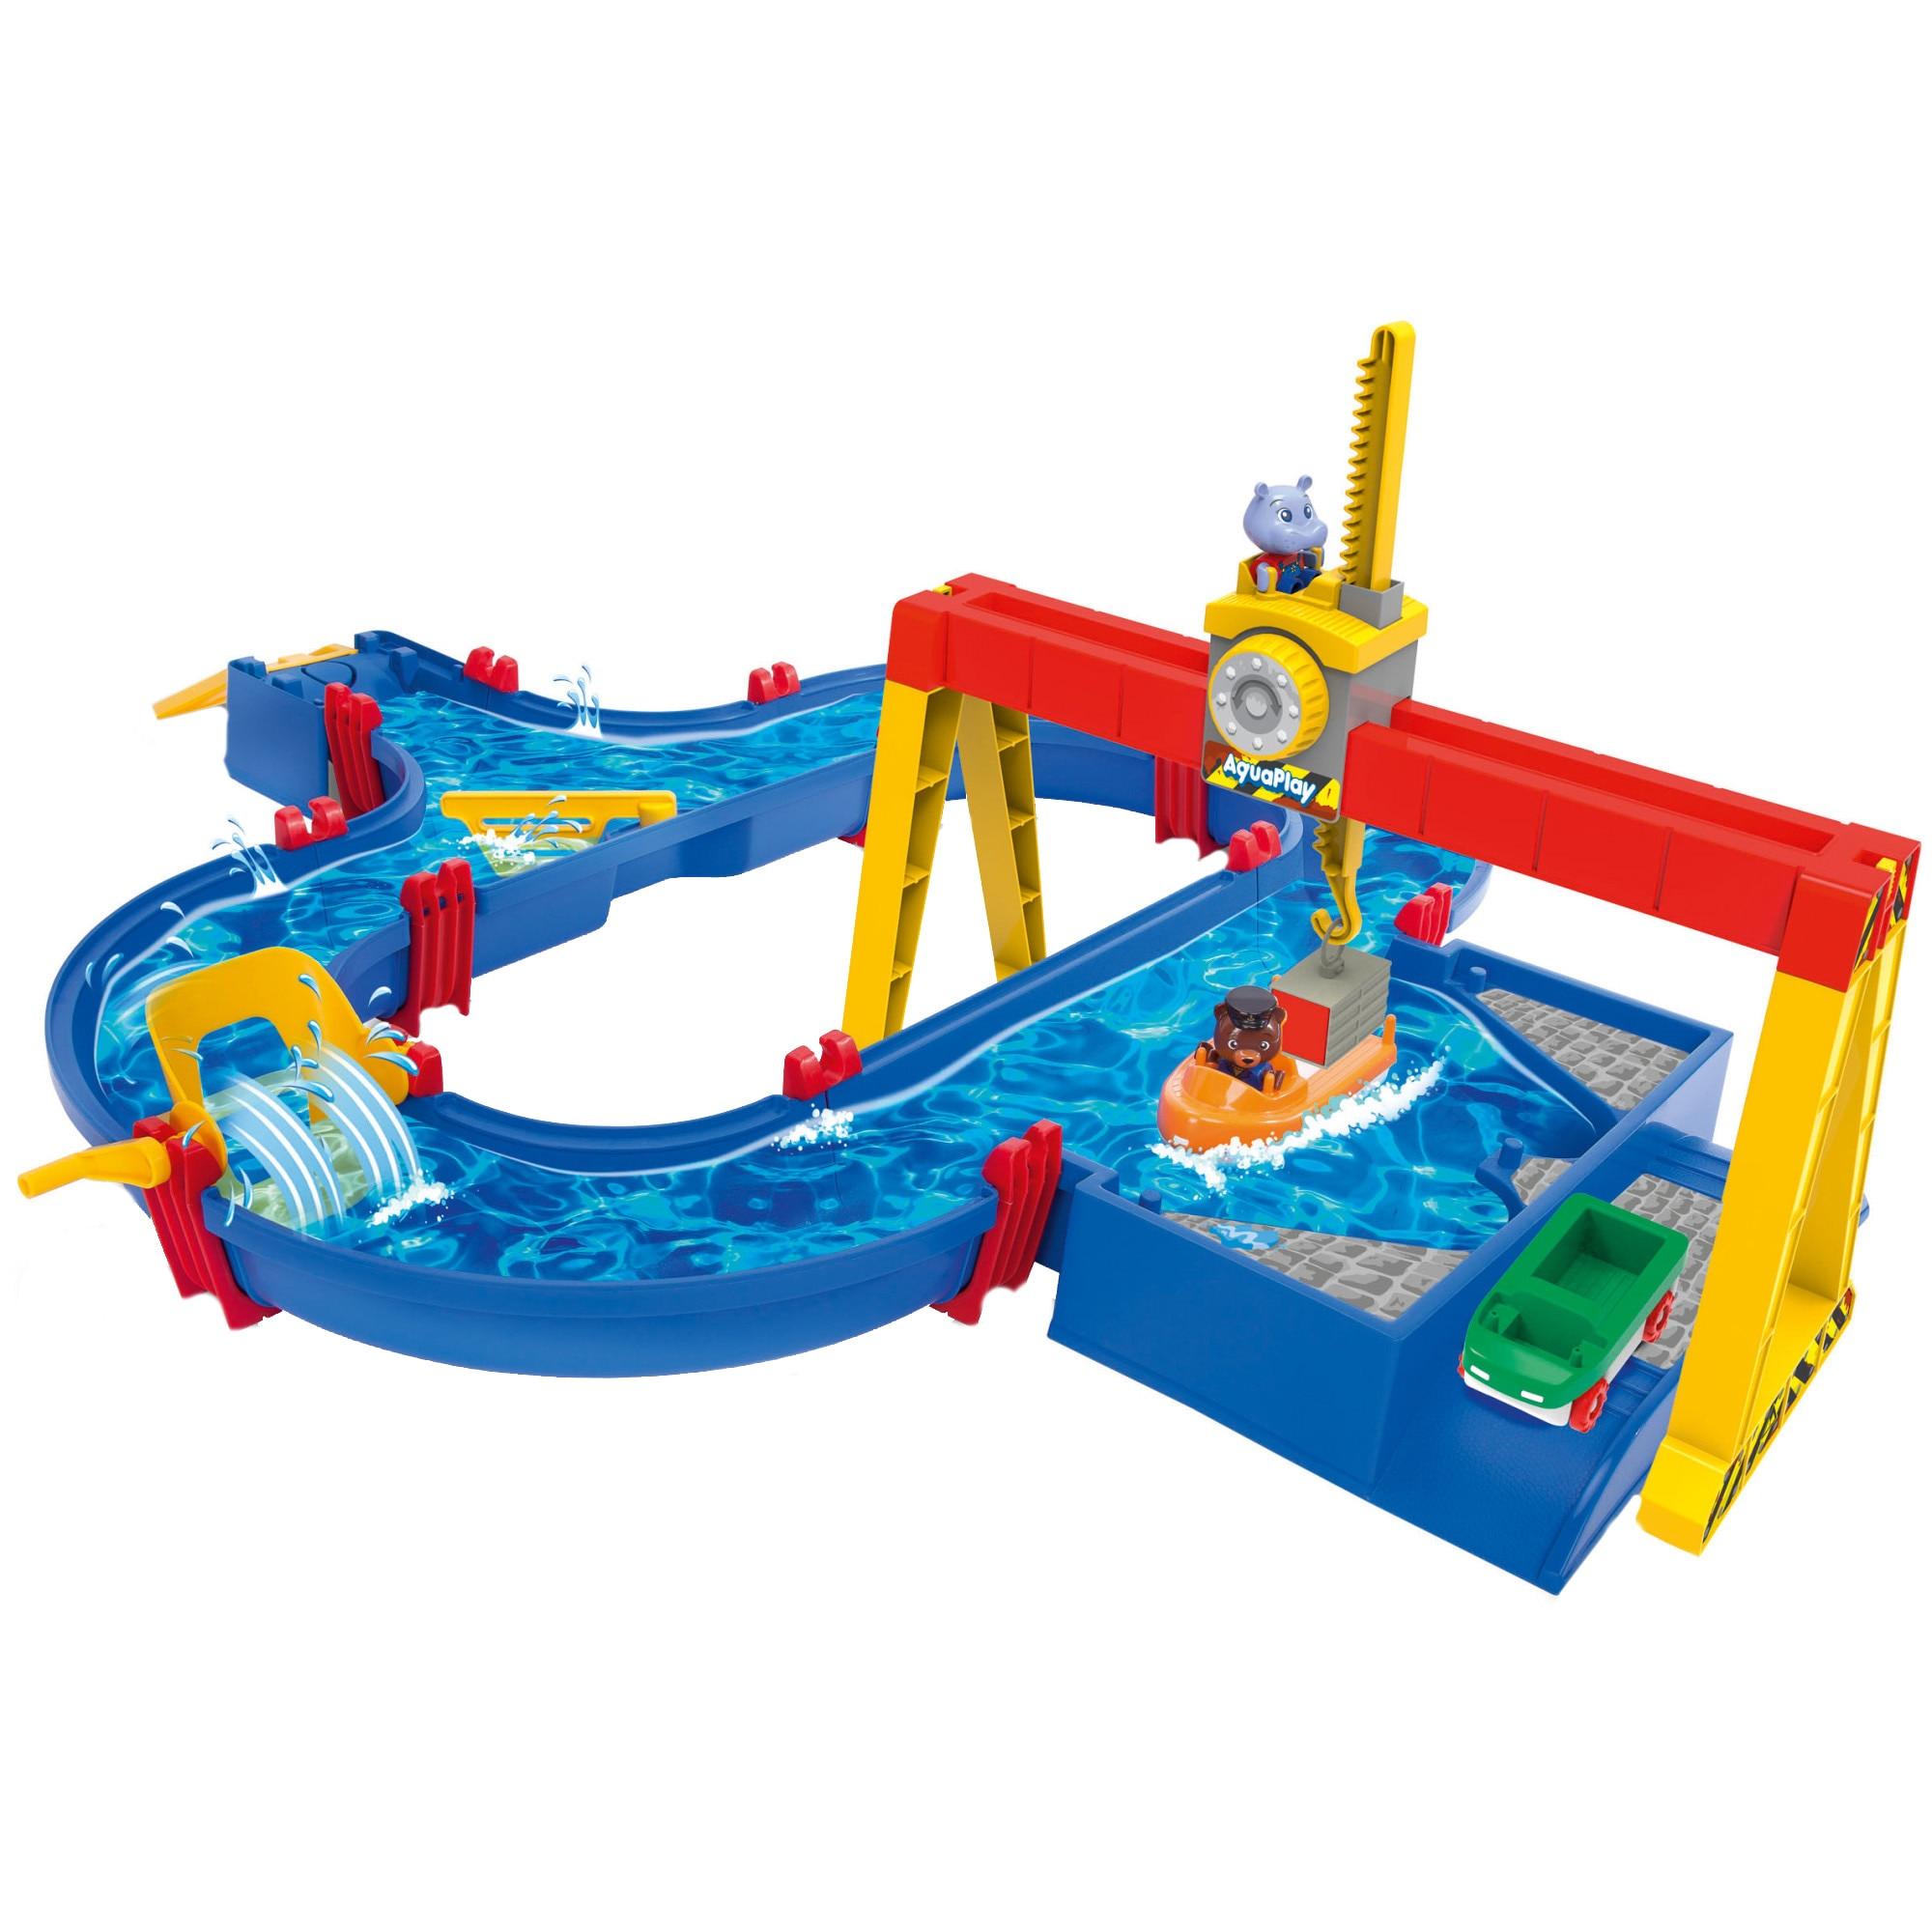 Fotografie Set de joaca AquaPlay, Pista cu apa - Container Port